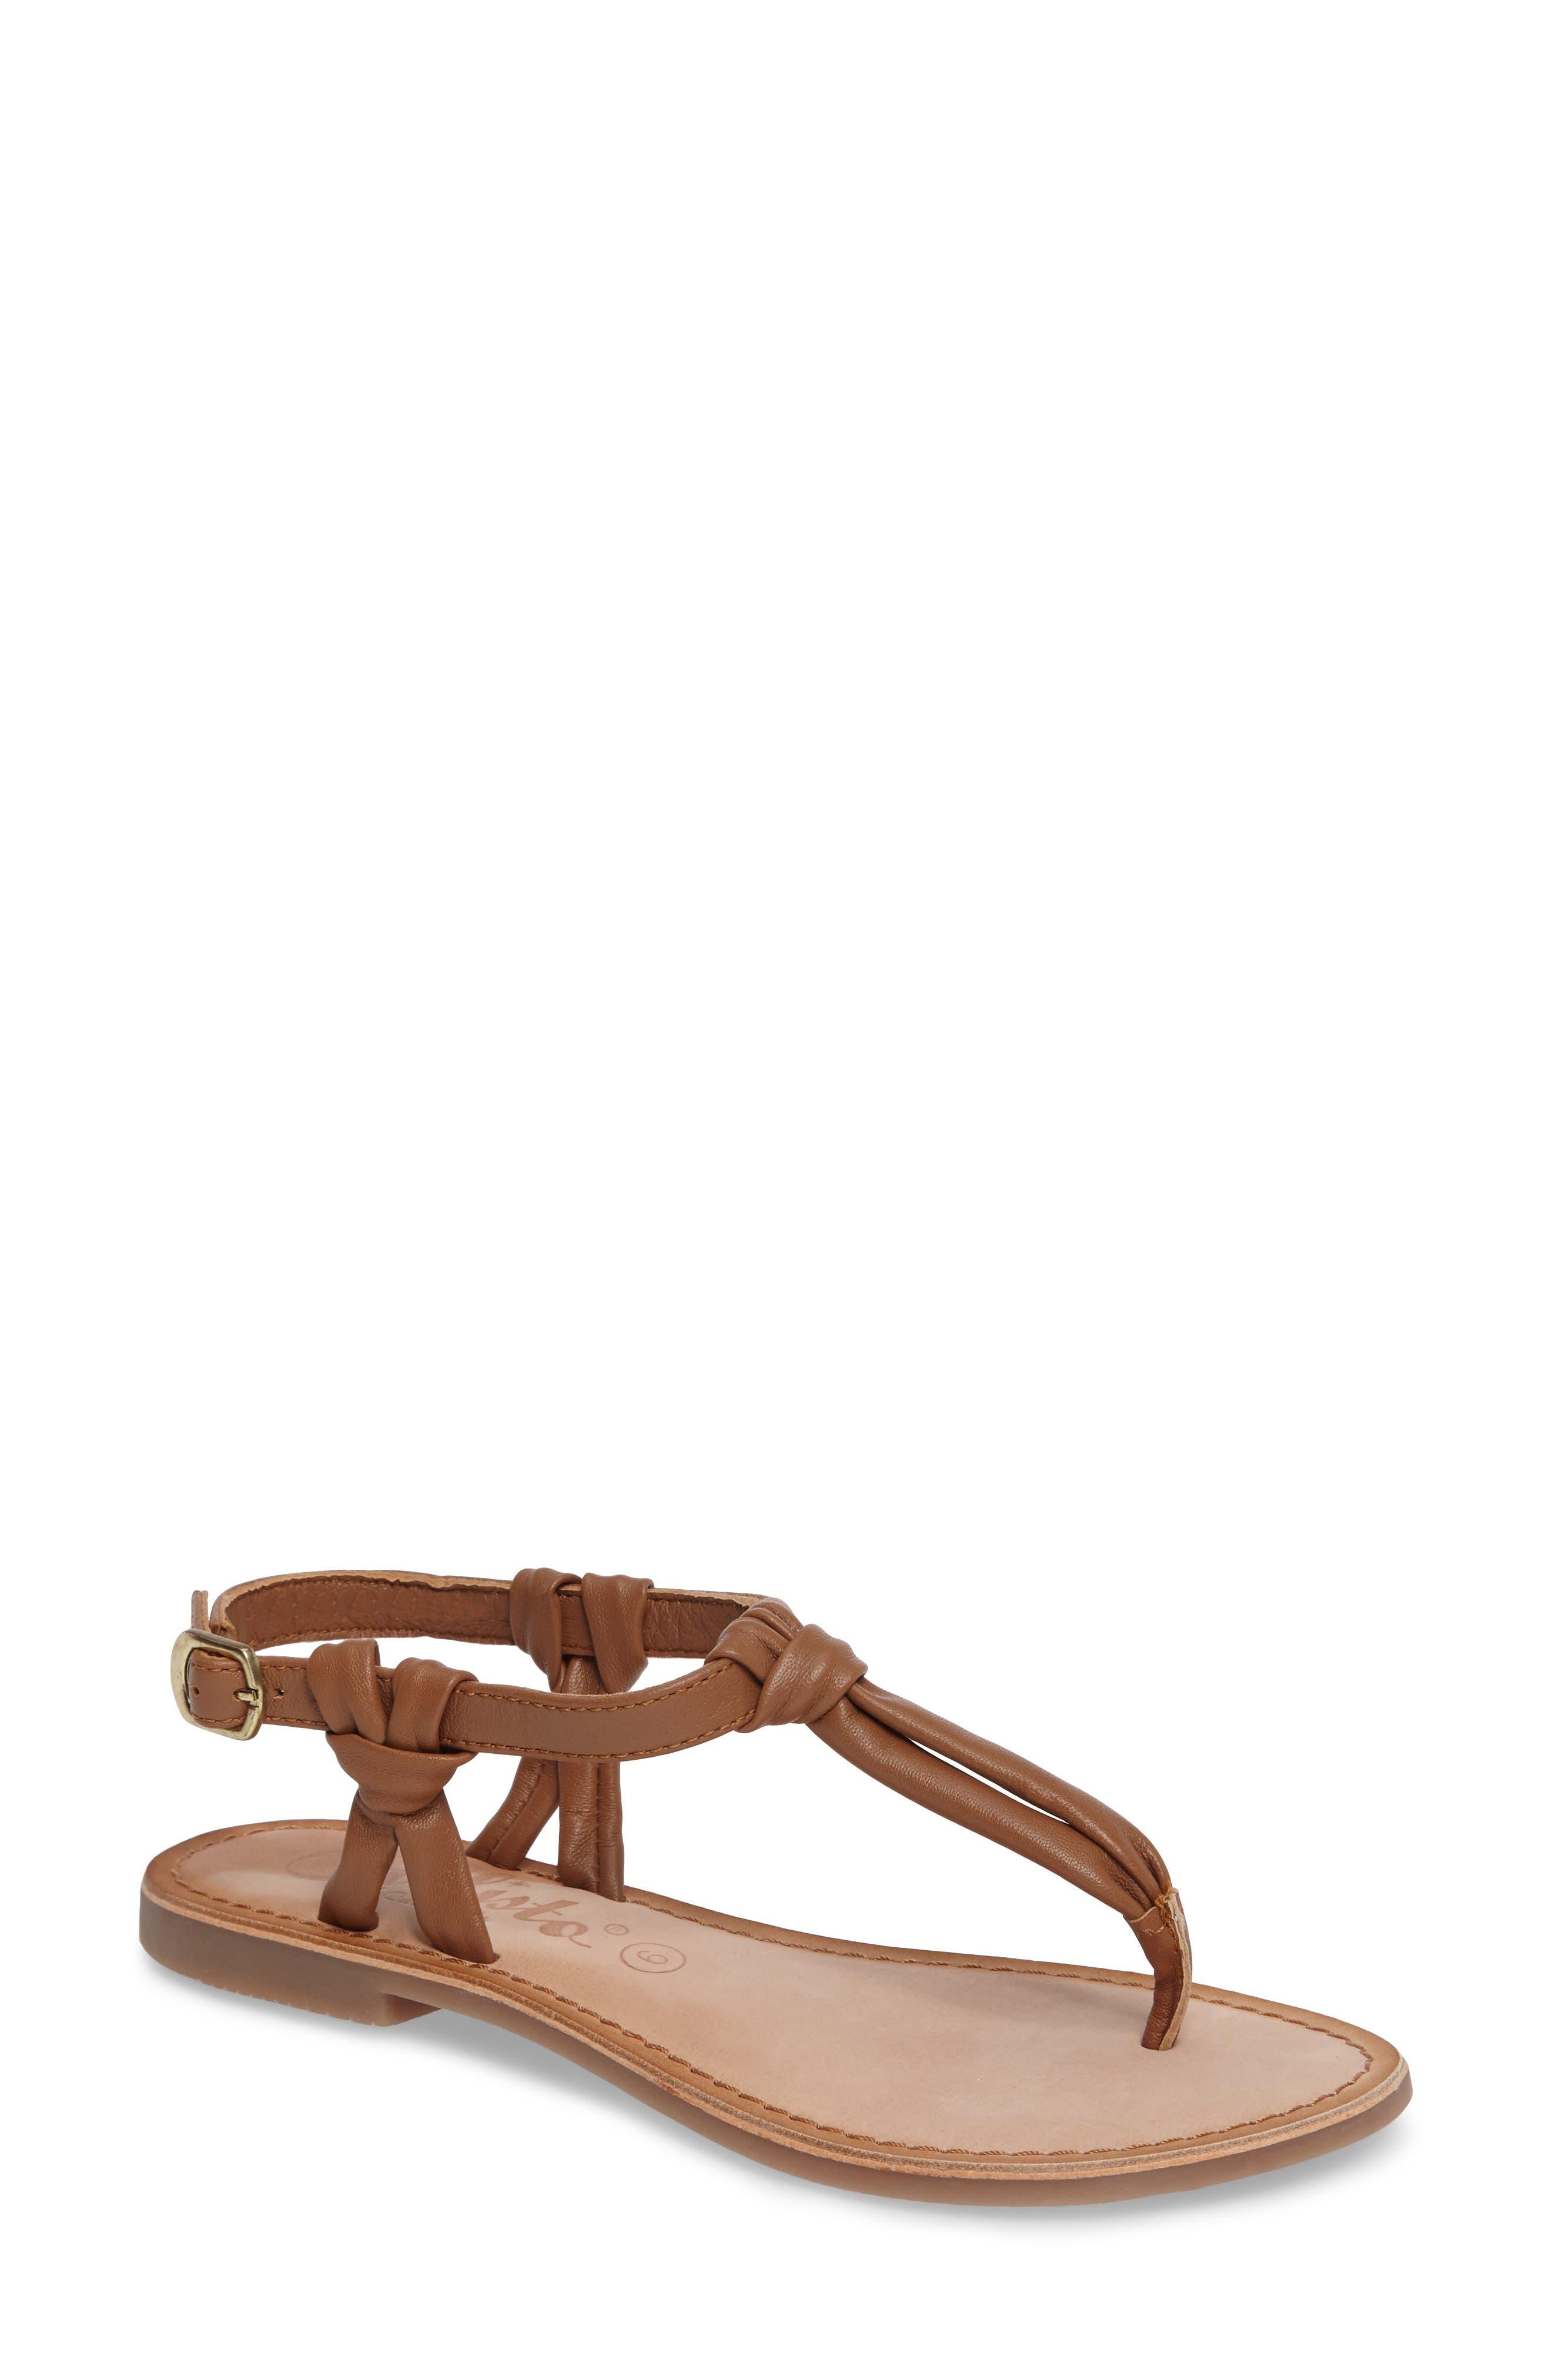 Main Image - Callisto Azza T-Strap Sandal (Women)